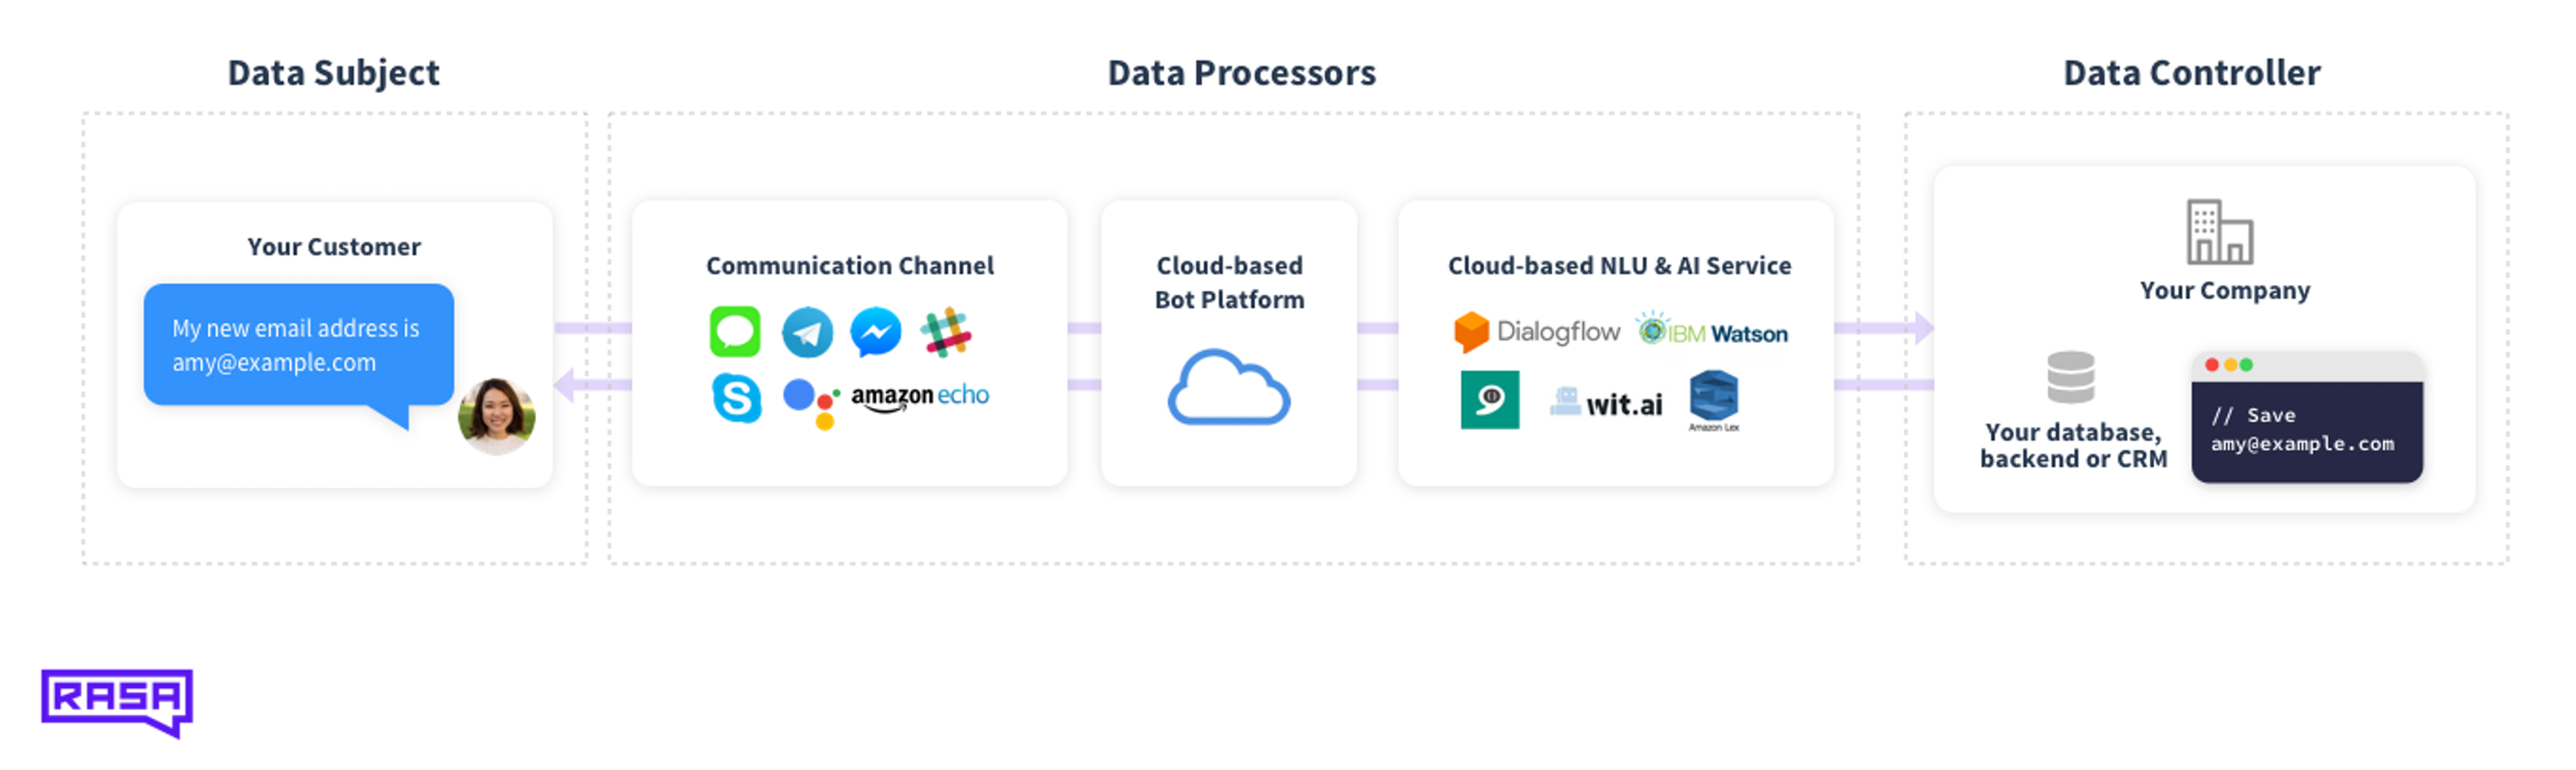 data_processor_controller-3